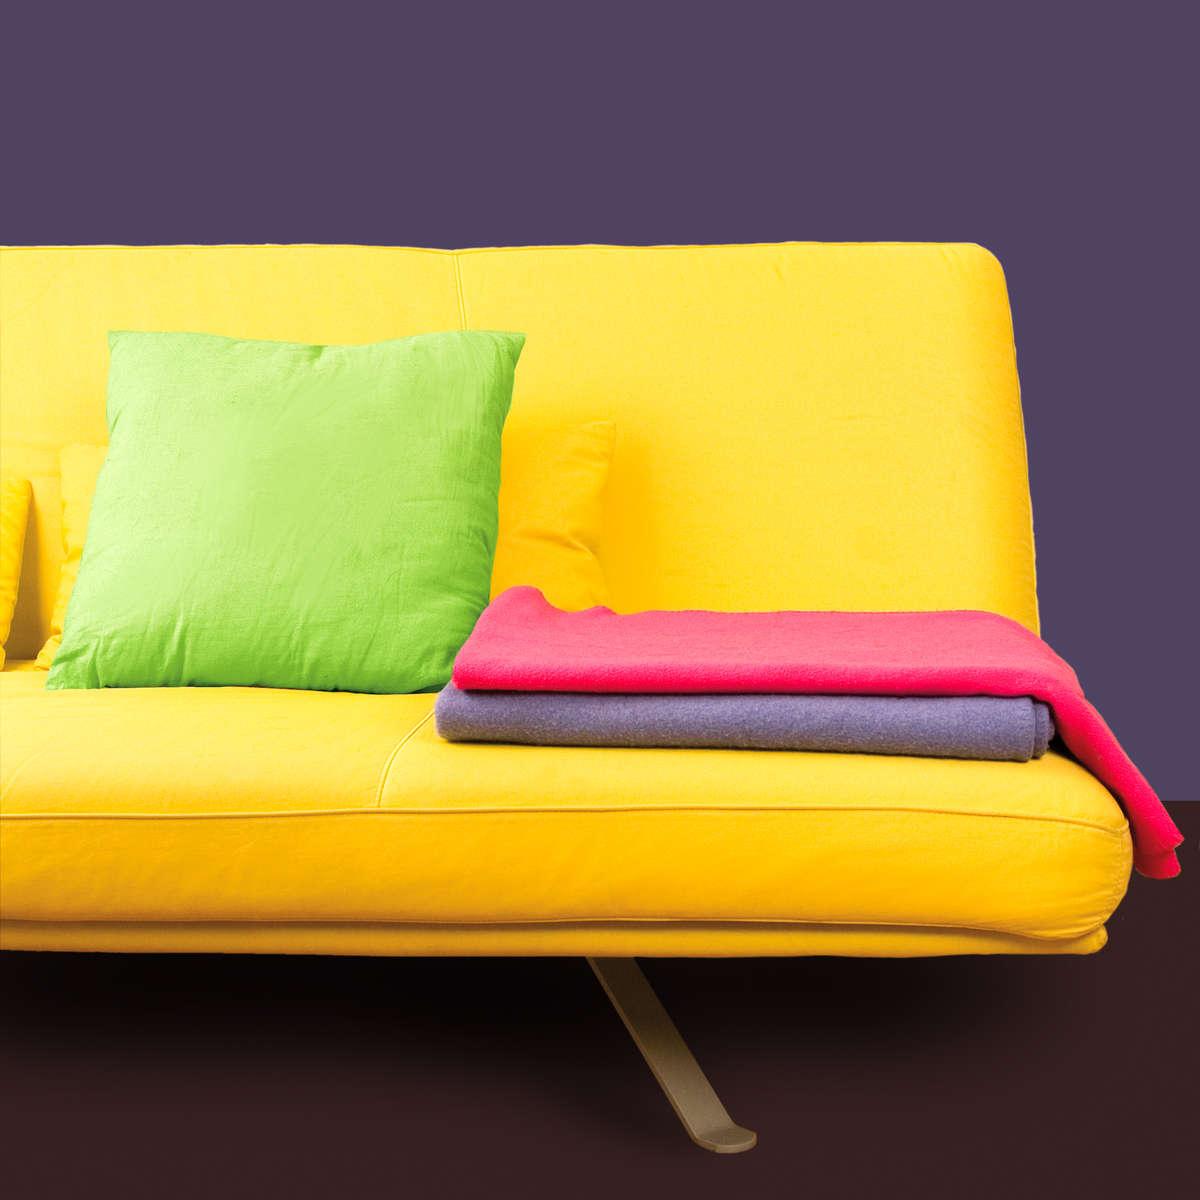 Stara kanapa a nowe wnętrze - full image